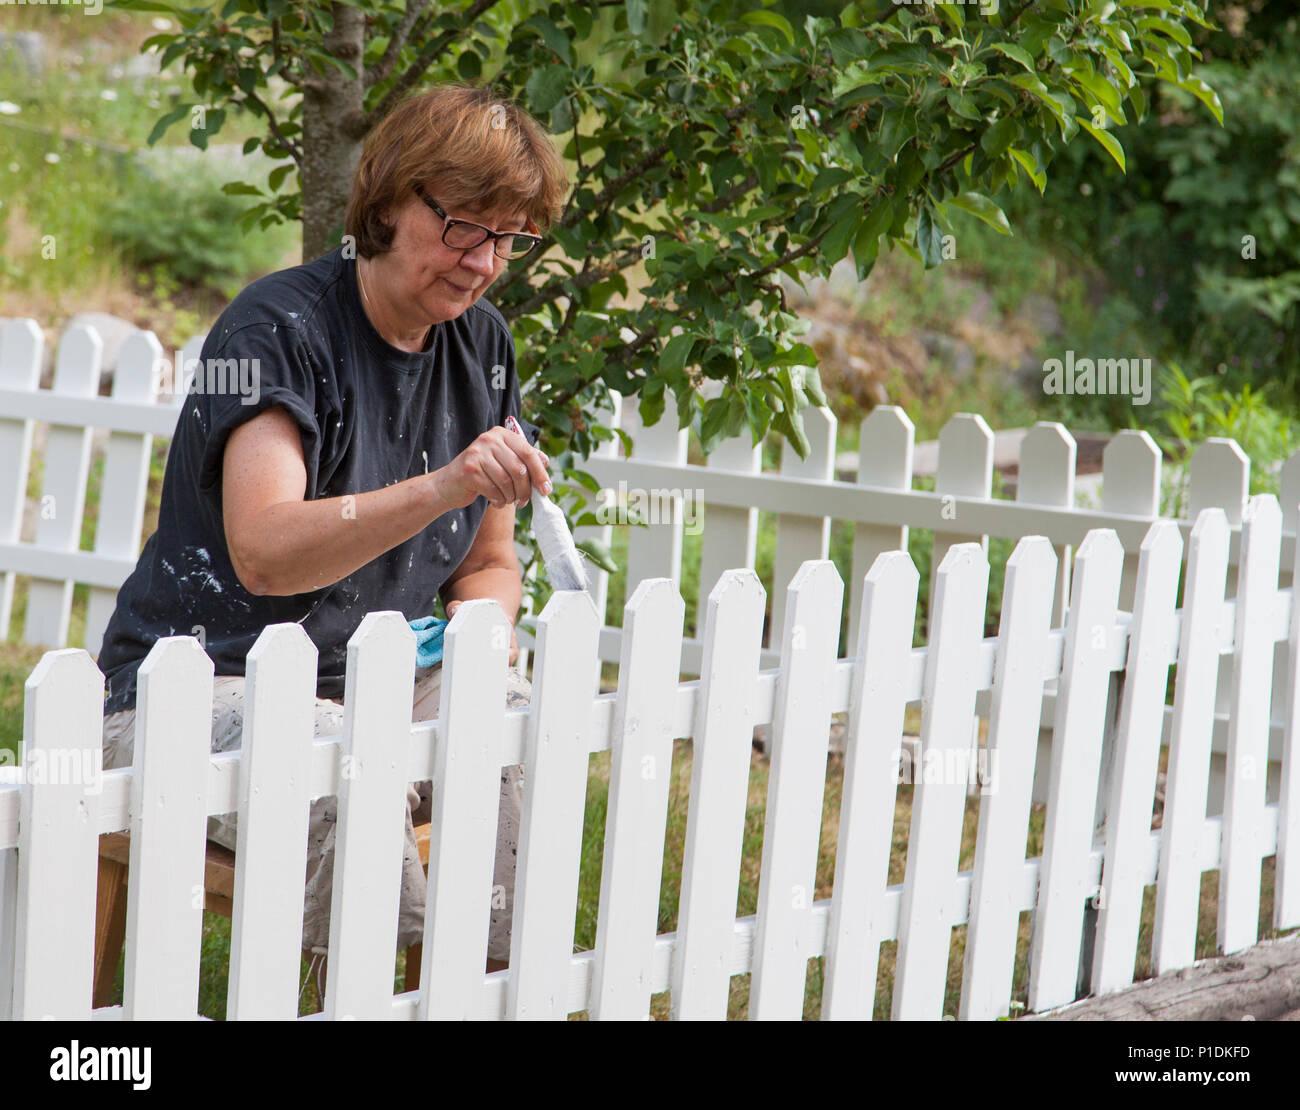 Malerei Der Zaun Im Garten 2018 Stockfoto Bild 207439777 Alamy